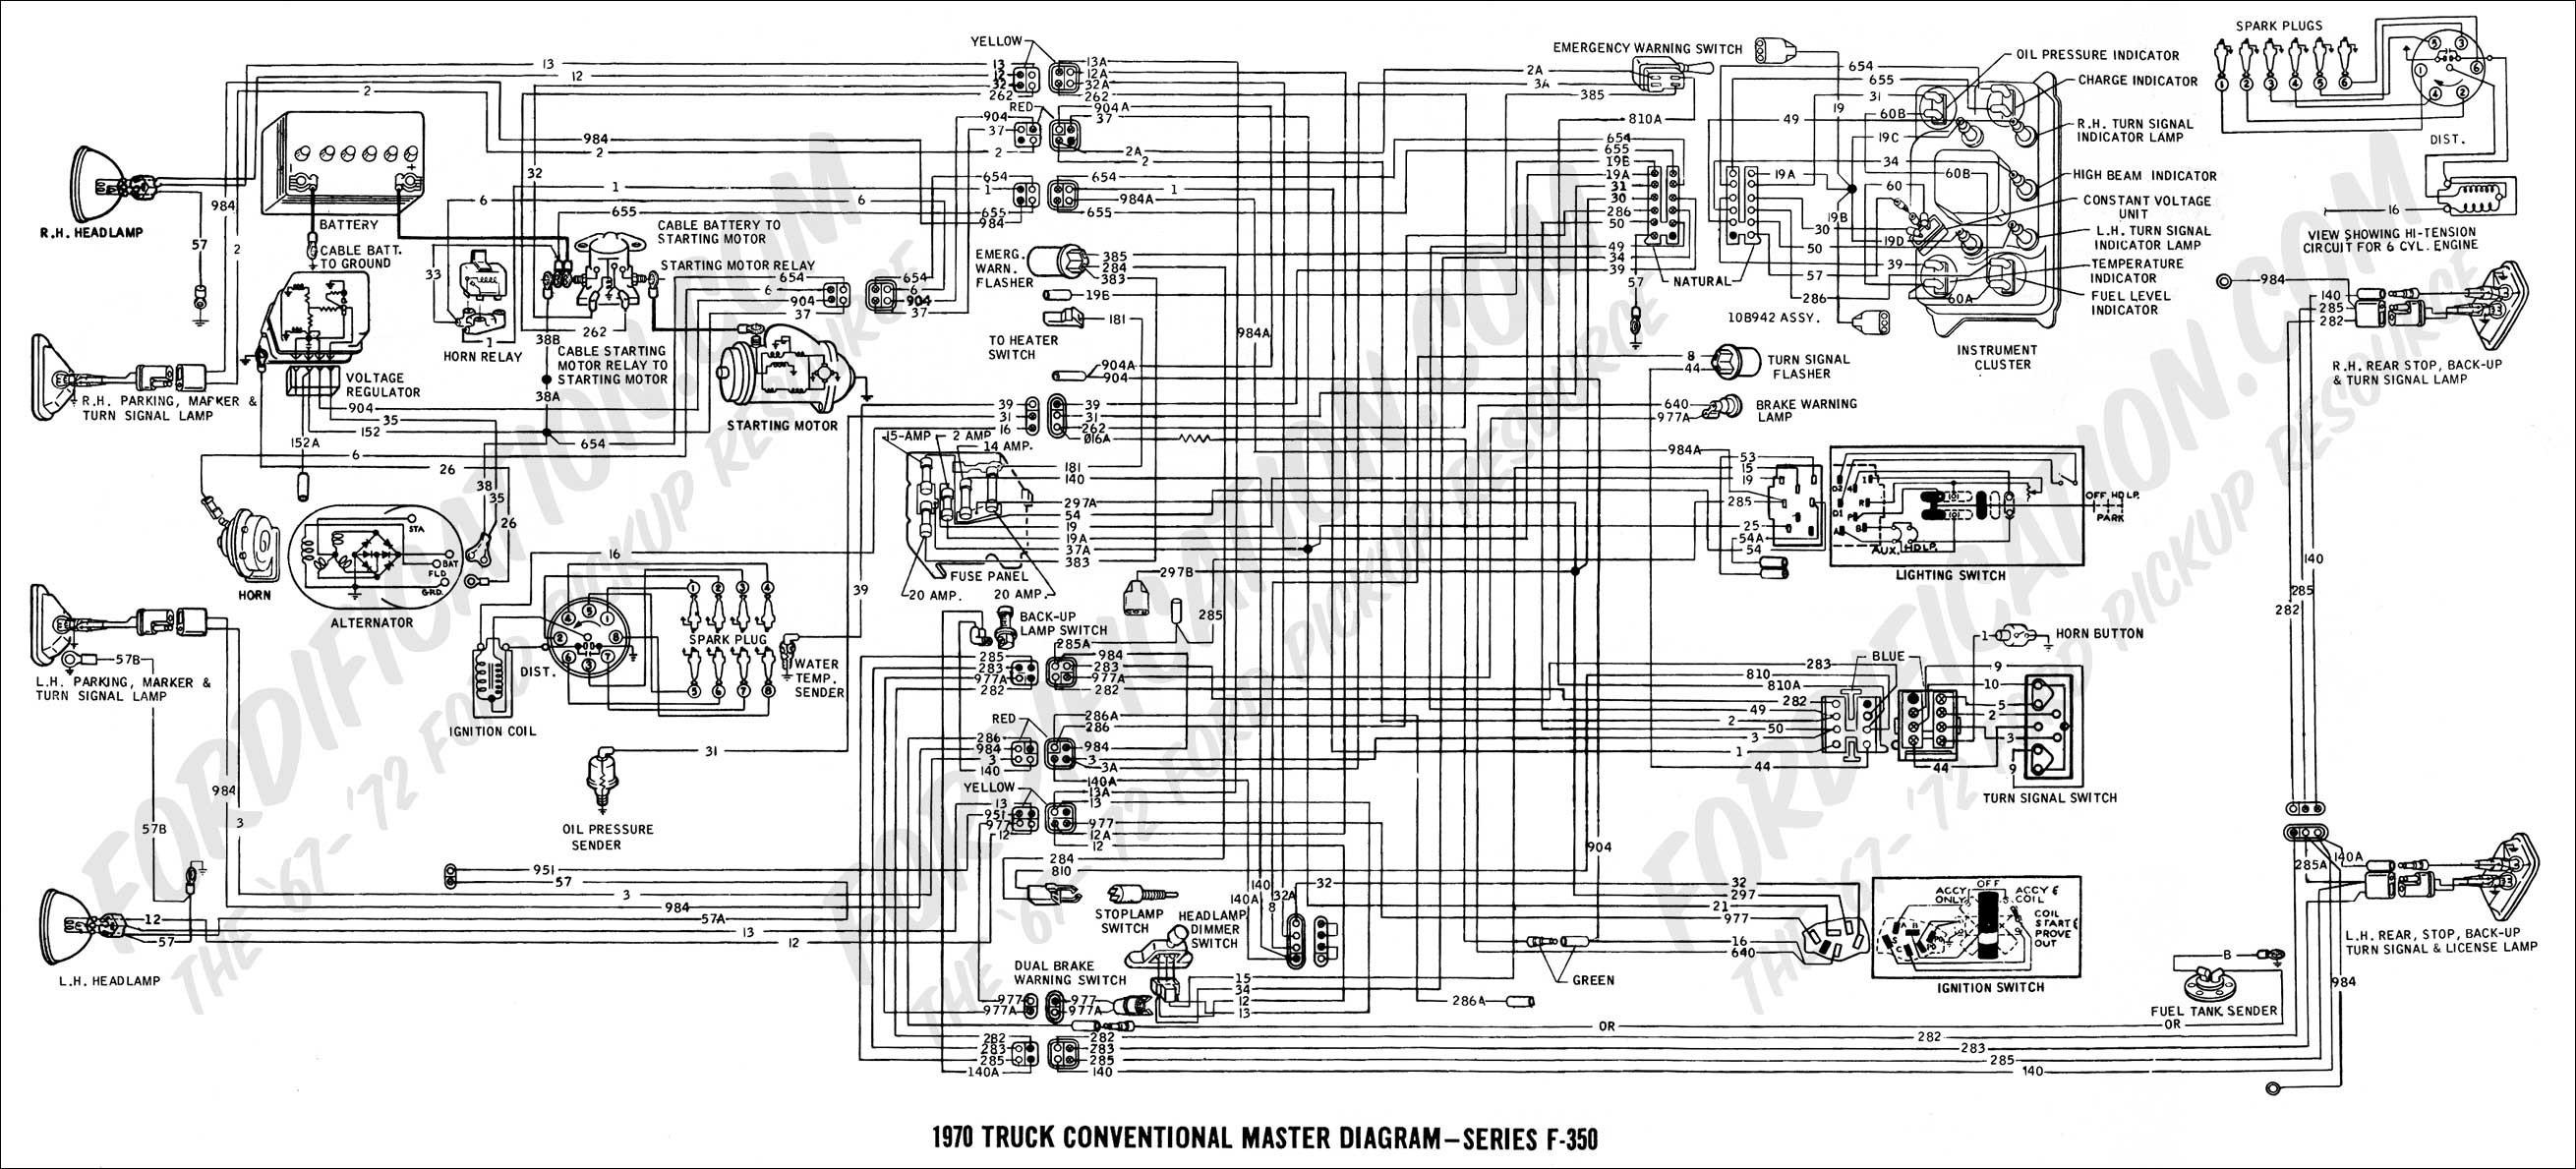 07 Ford F650 Wiring Diagram Speedometor 700r4 Transmission Wiring Diagram For Wiring Diagram Schematics